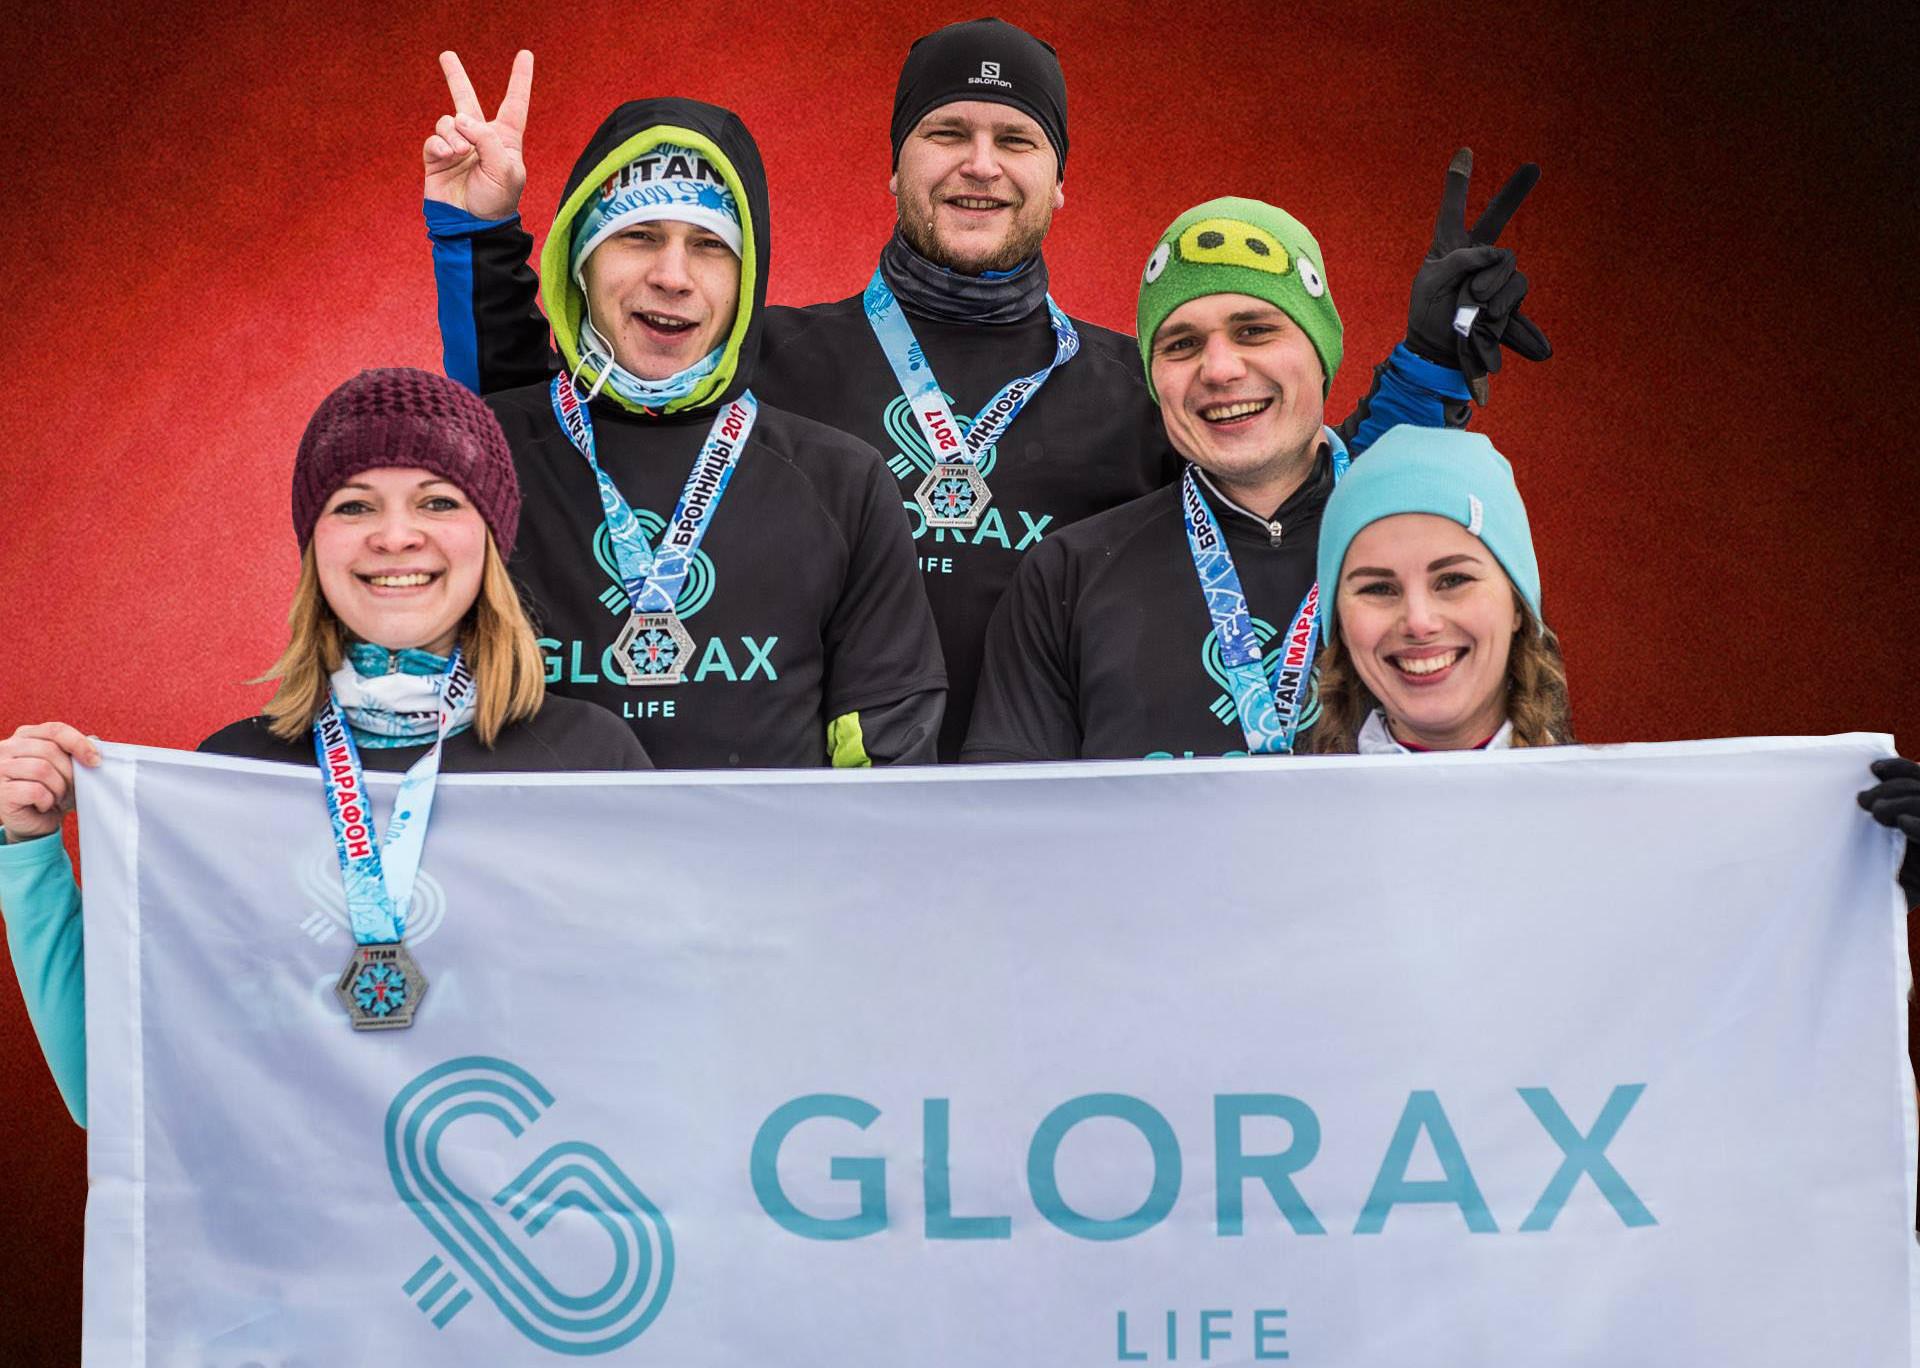 Glorax Life - участник забега Titan